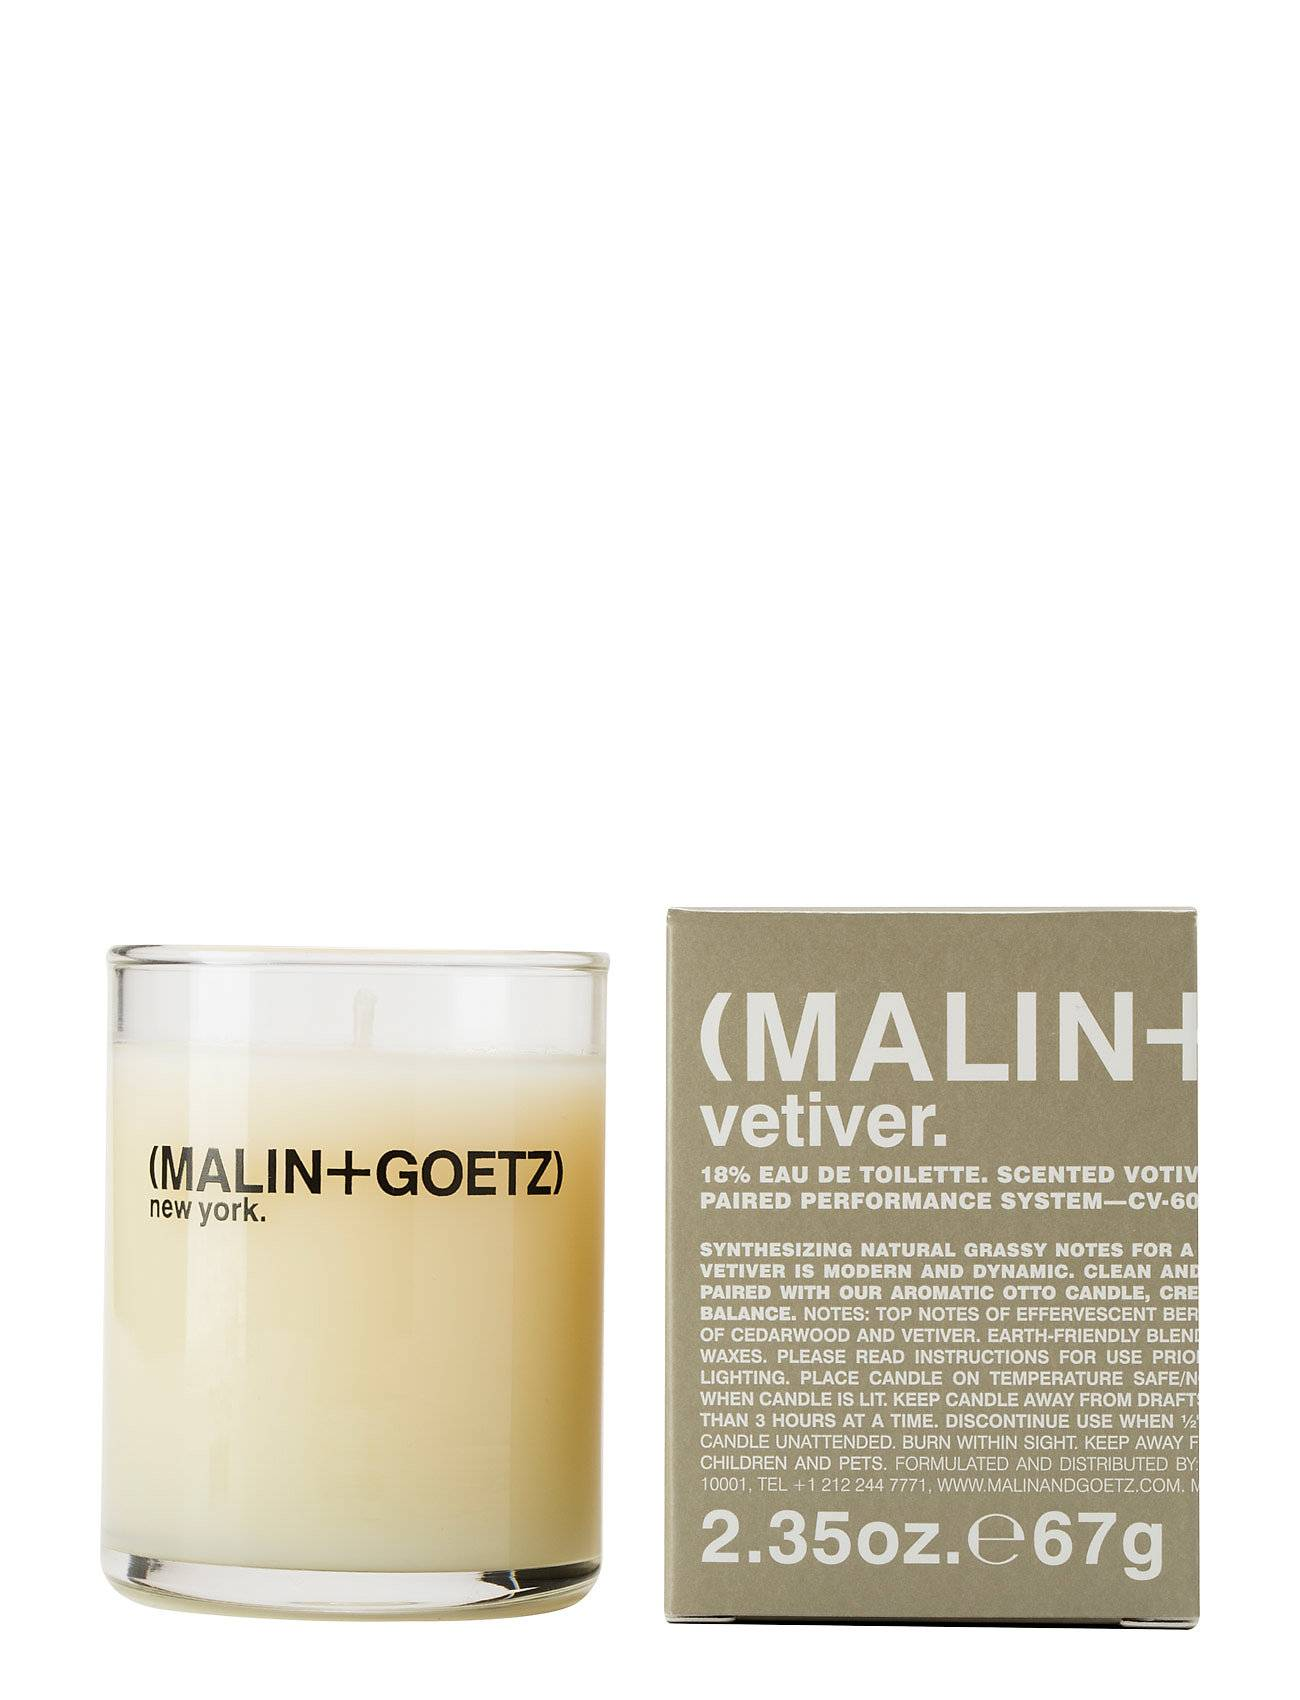 Malin+Goetz Vetiver Votive Candle